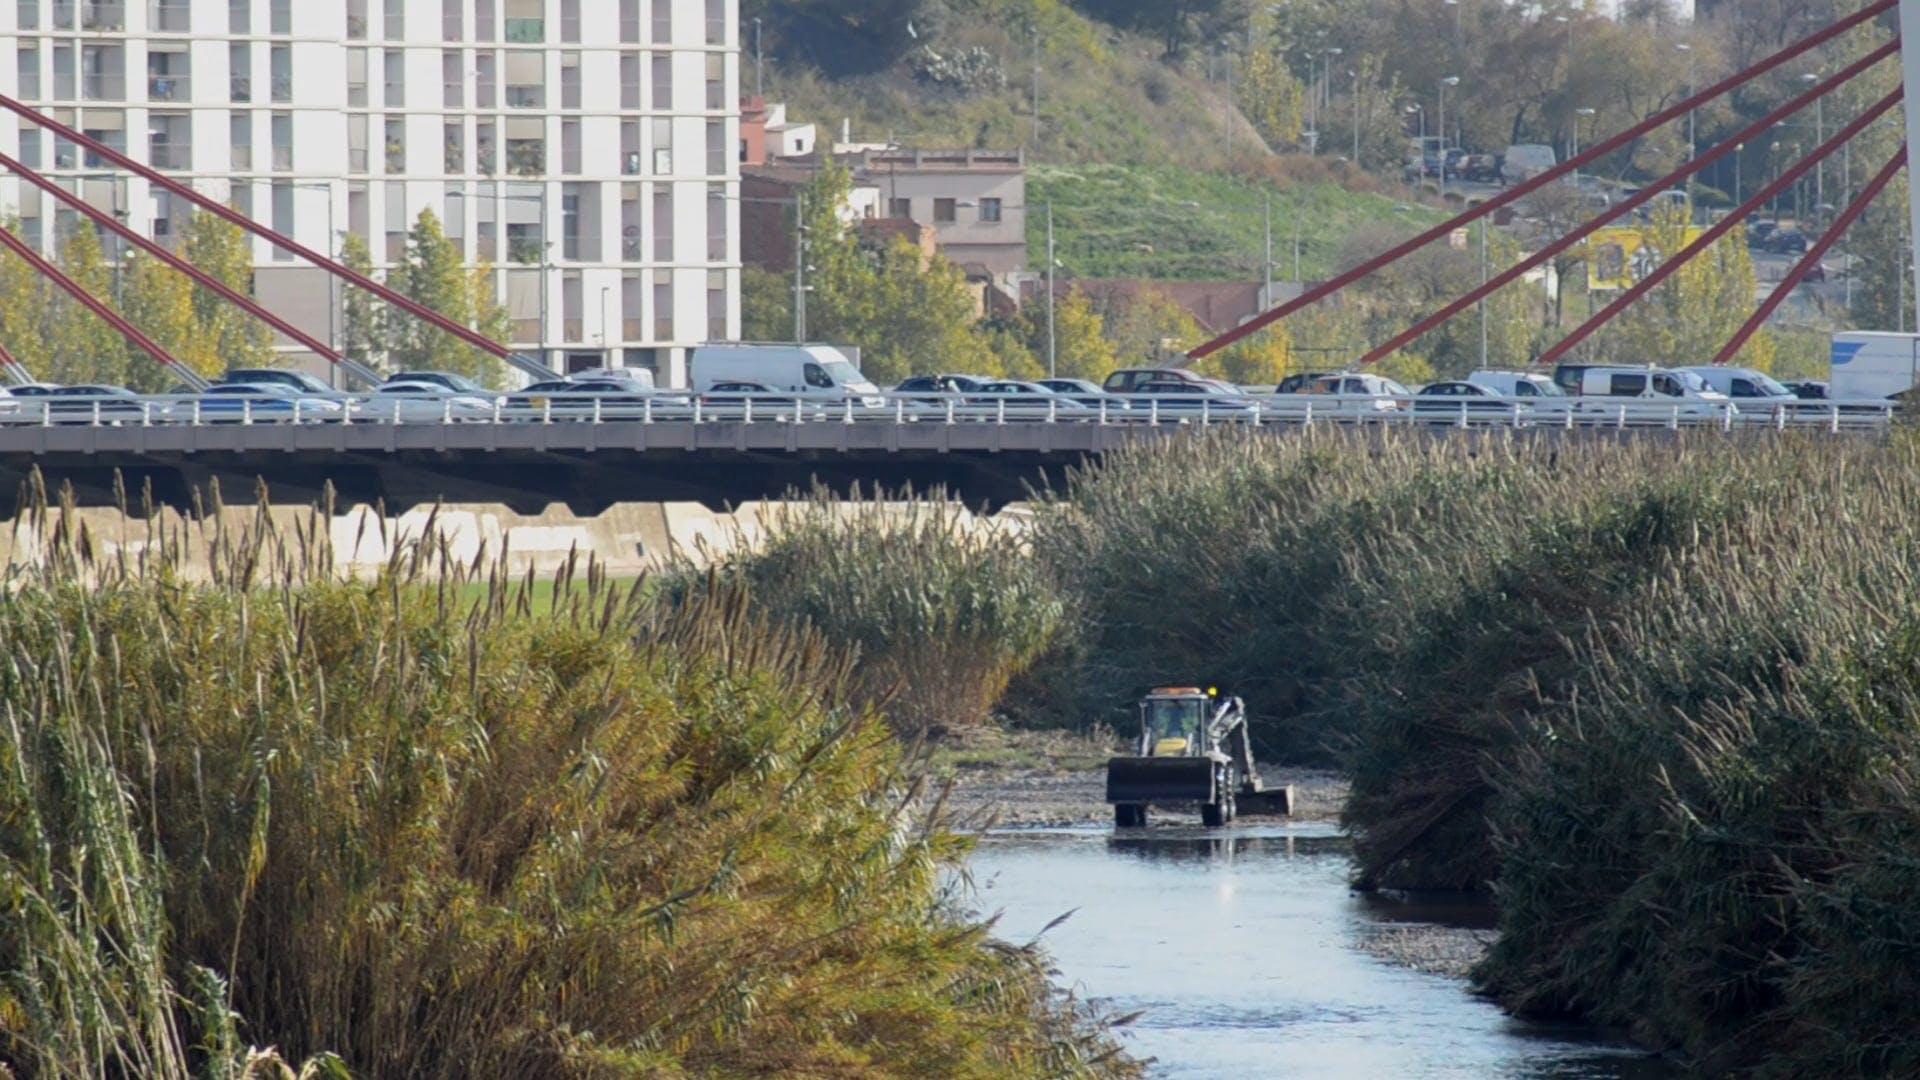 Cars On A Bridge